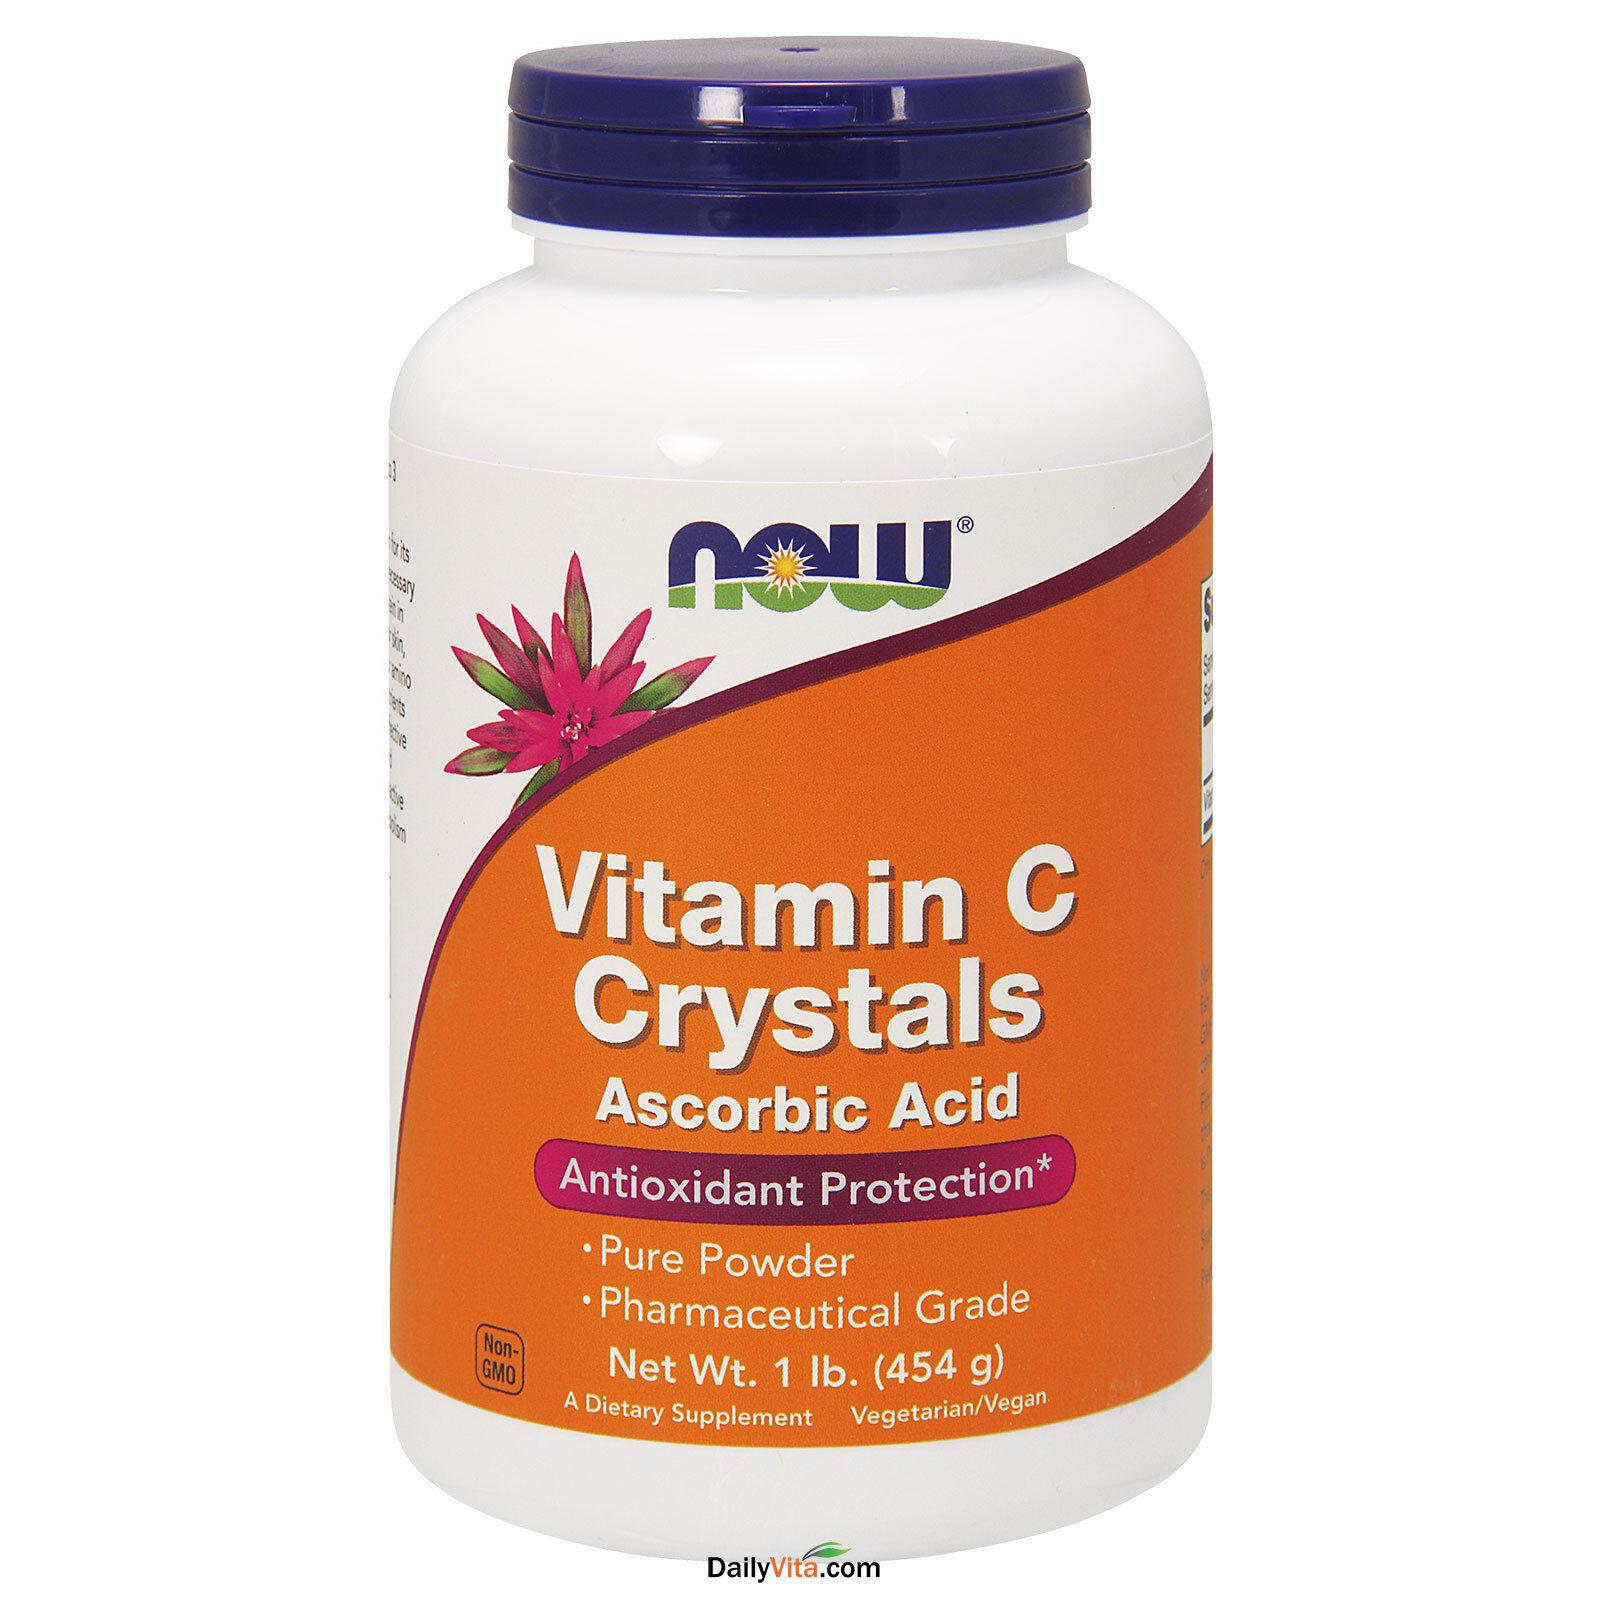 3 x NOW Vitamin C Crystals 1 lb, 100% Pure Ascorbic Acid Powder 1 lb, USP, FRESH 733739007926   eBay